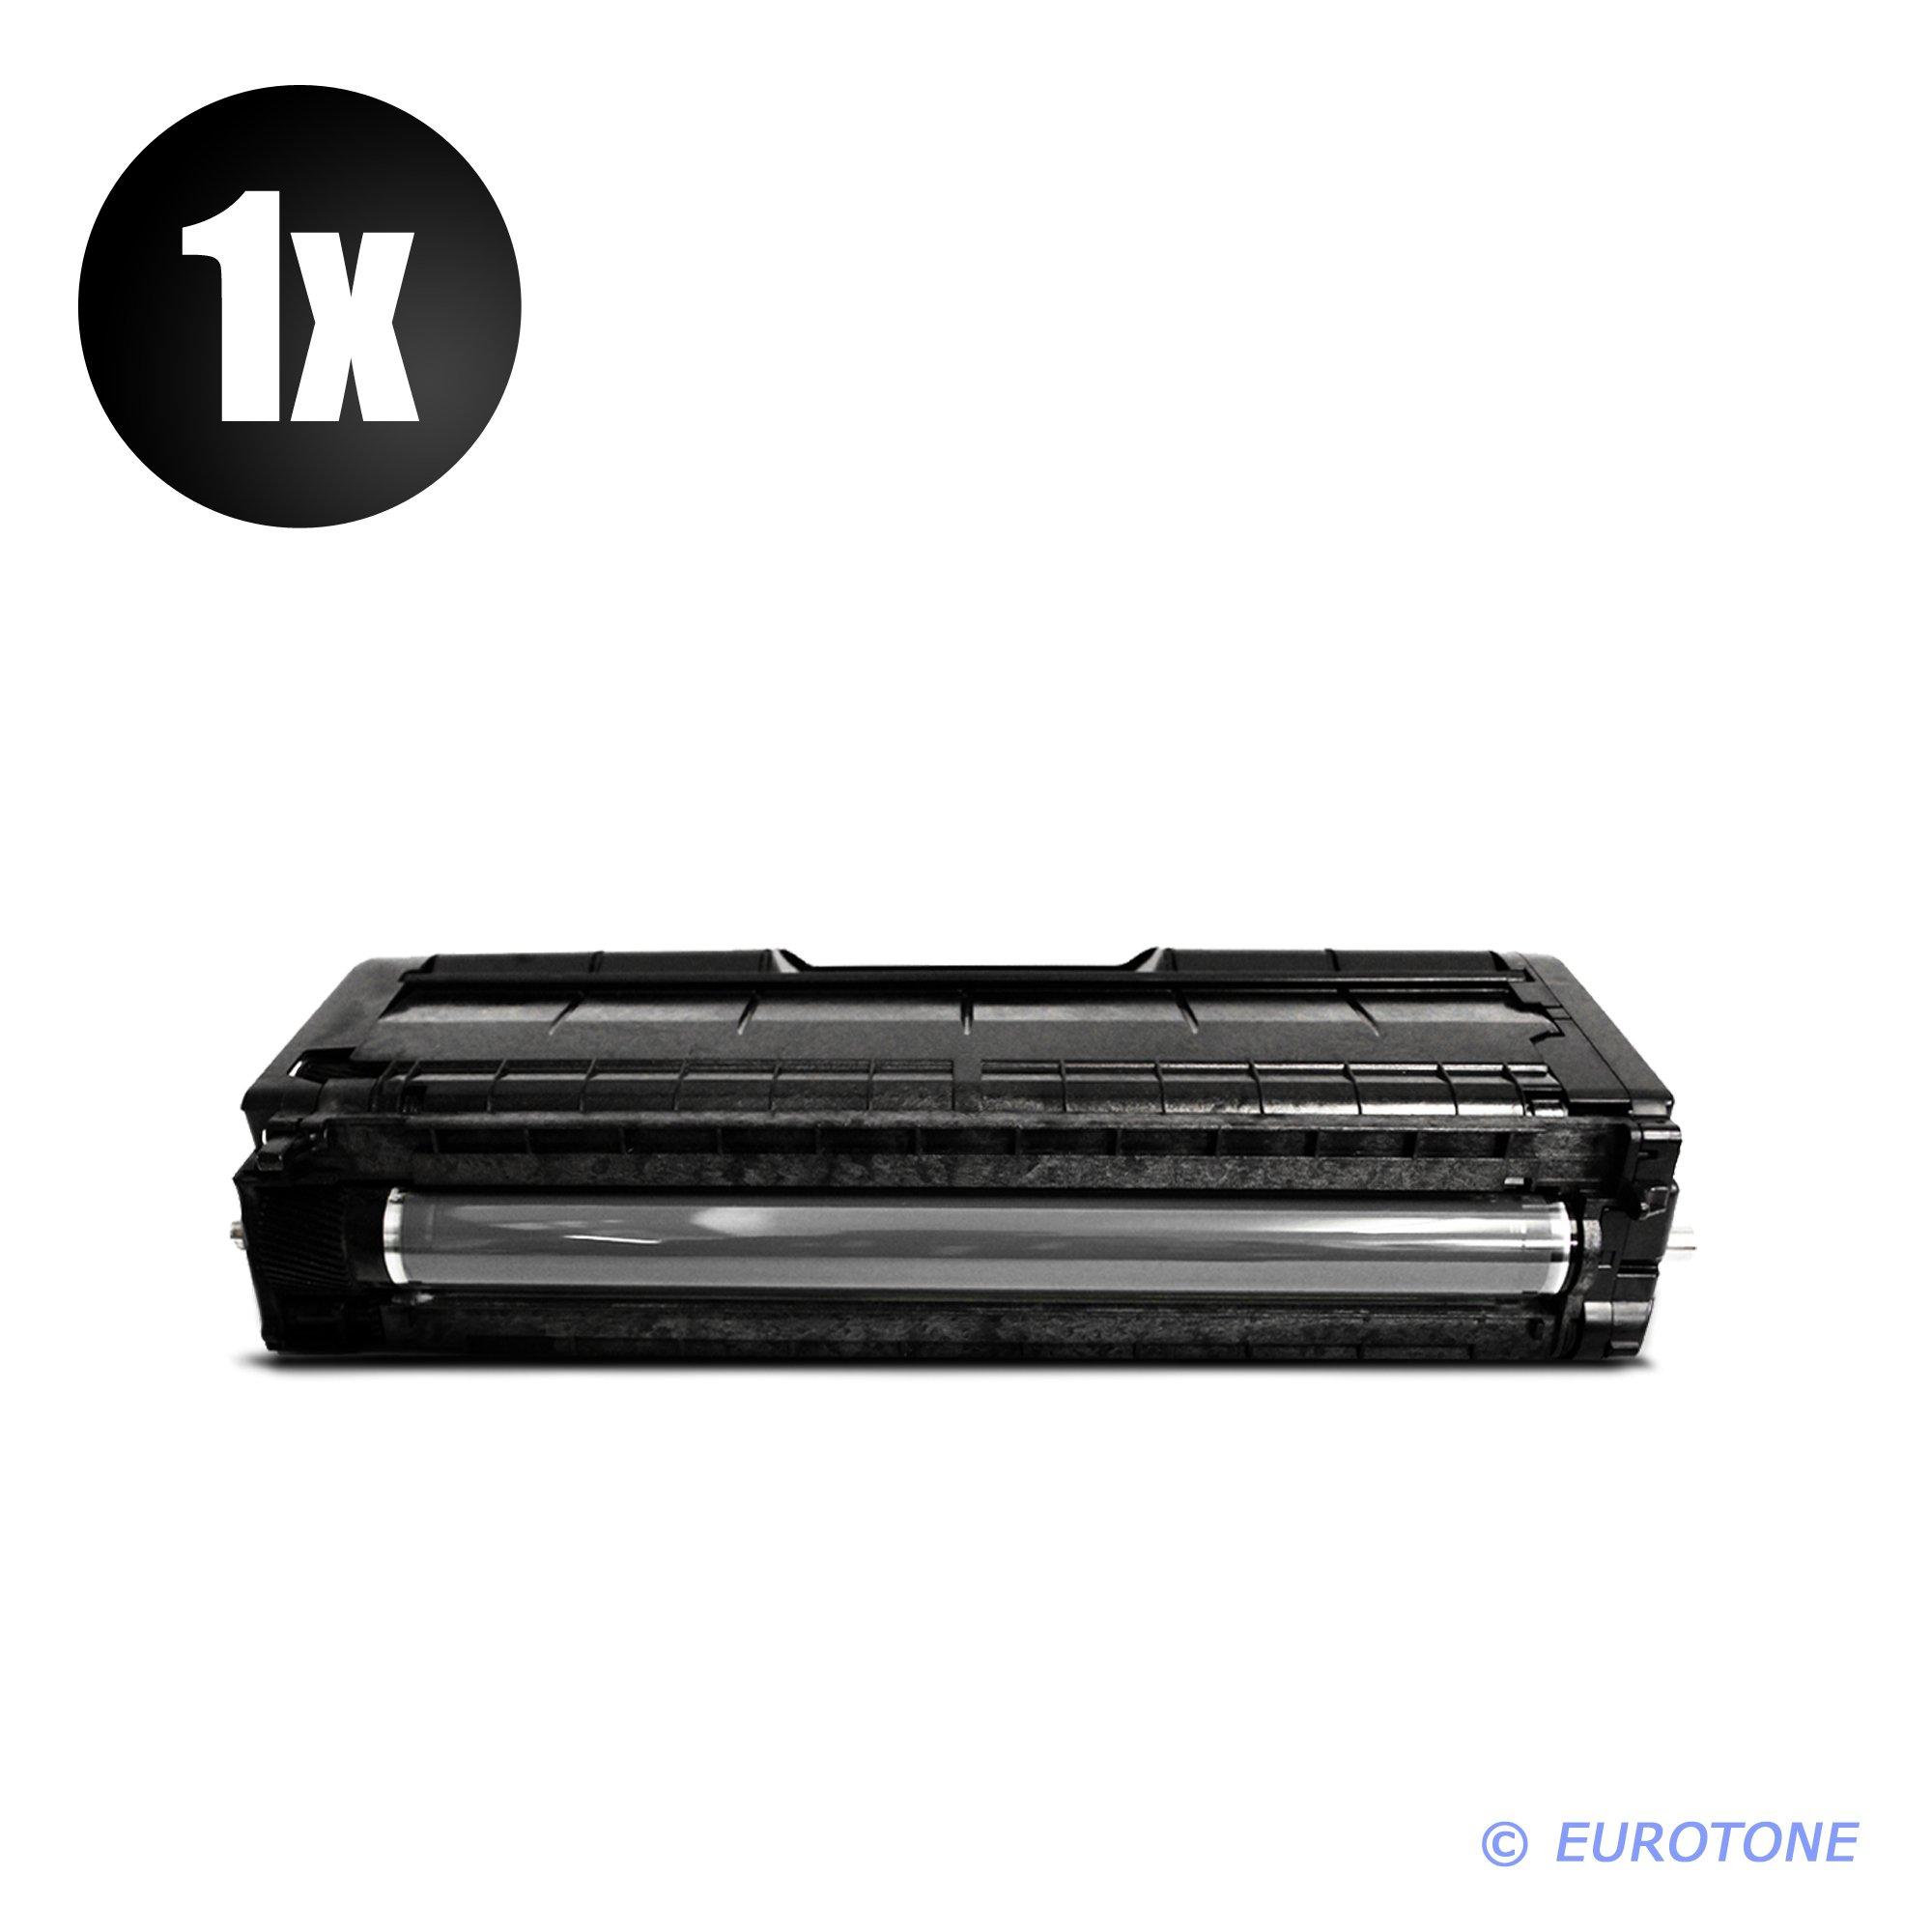 Eurotone-Toner-Kartuschen-fr-Ricoh-Aficio-SP-C250SF-SP-C250DN-Parent